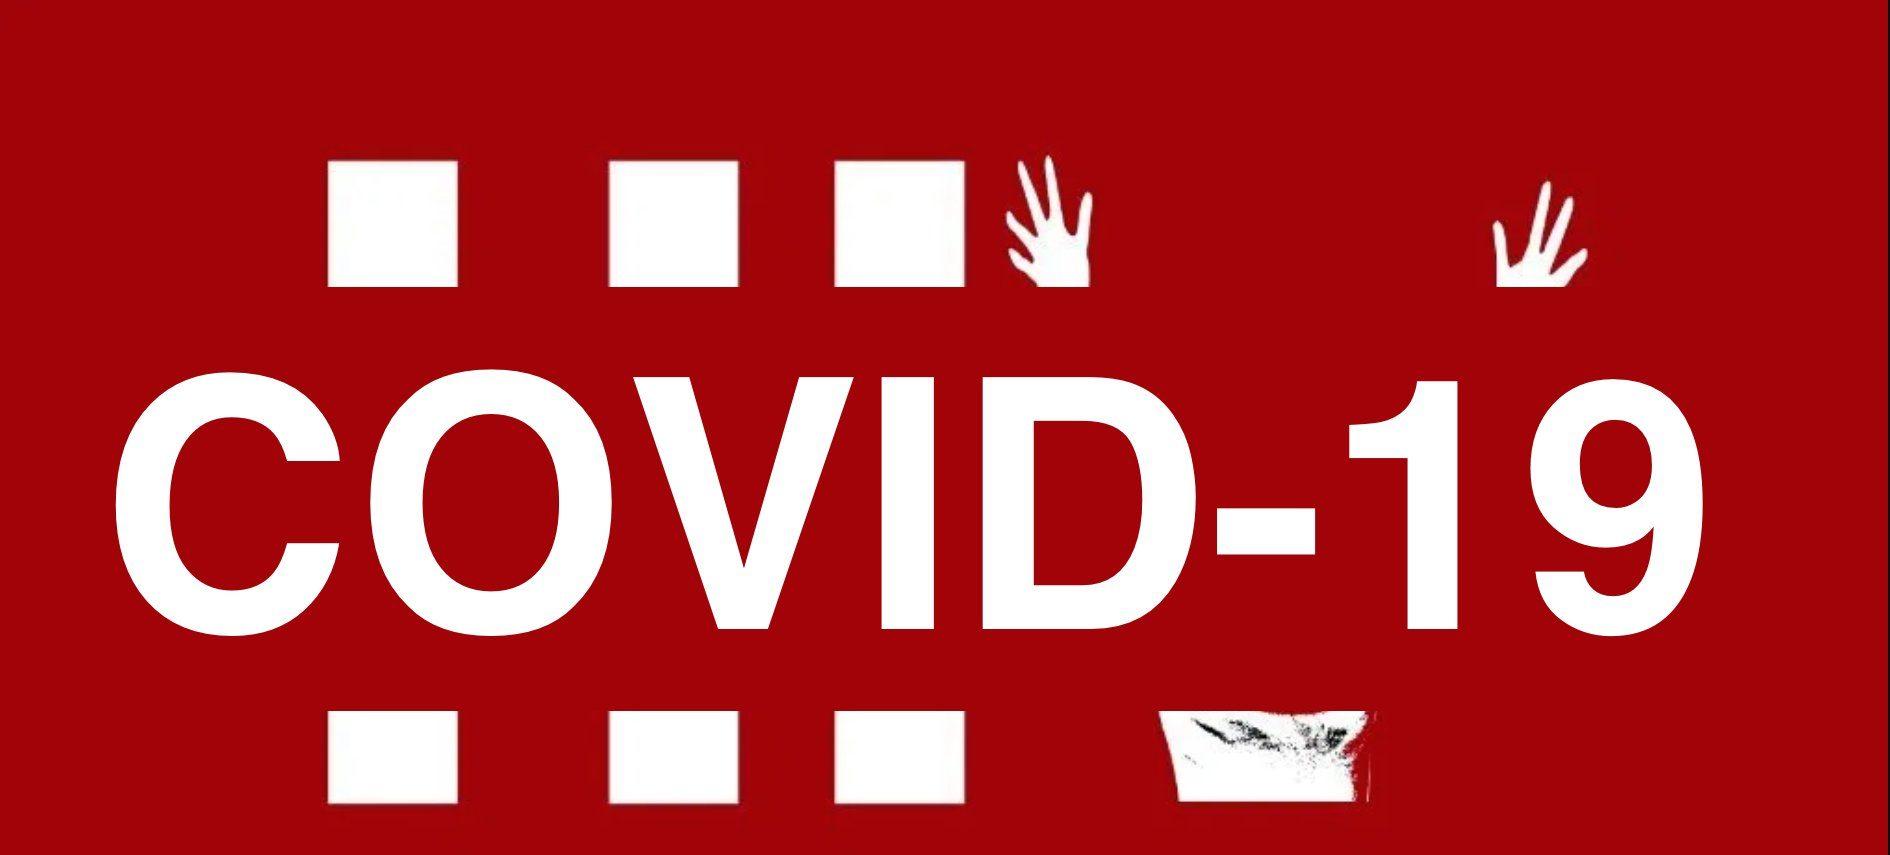 STATEMENT ON COVID-19 CRIMINALISATION